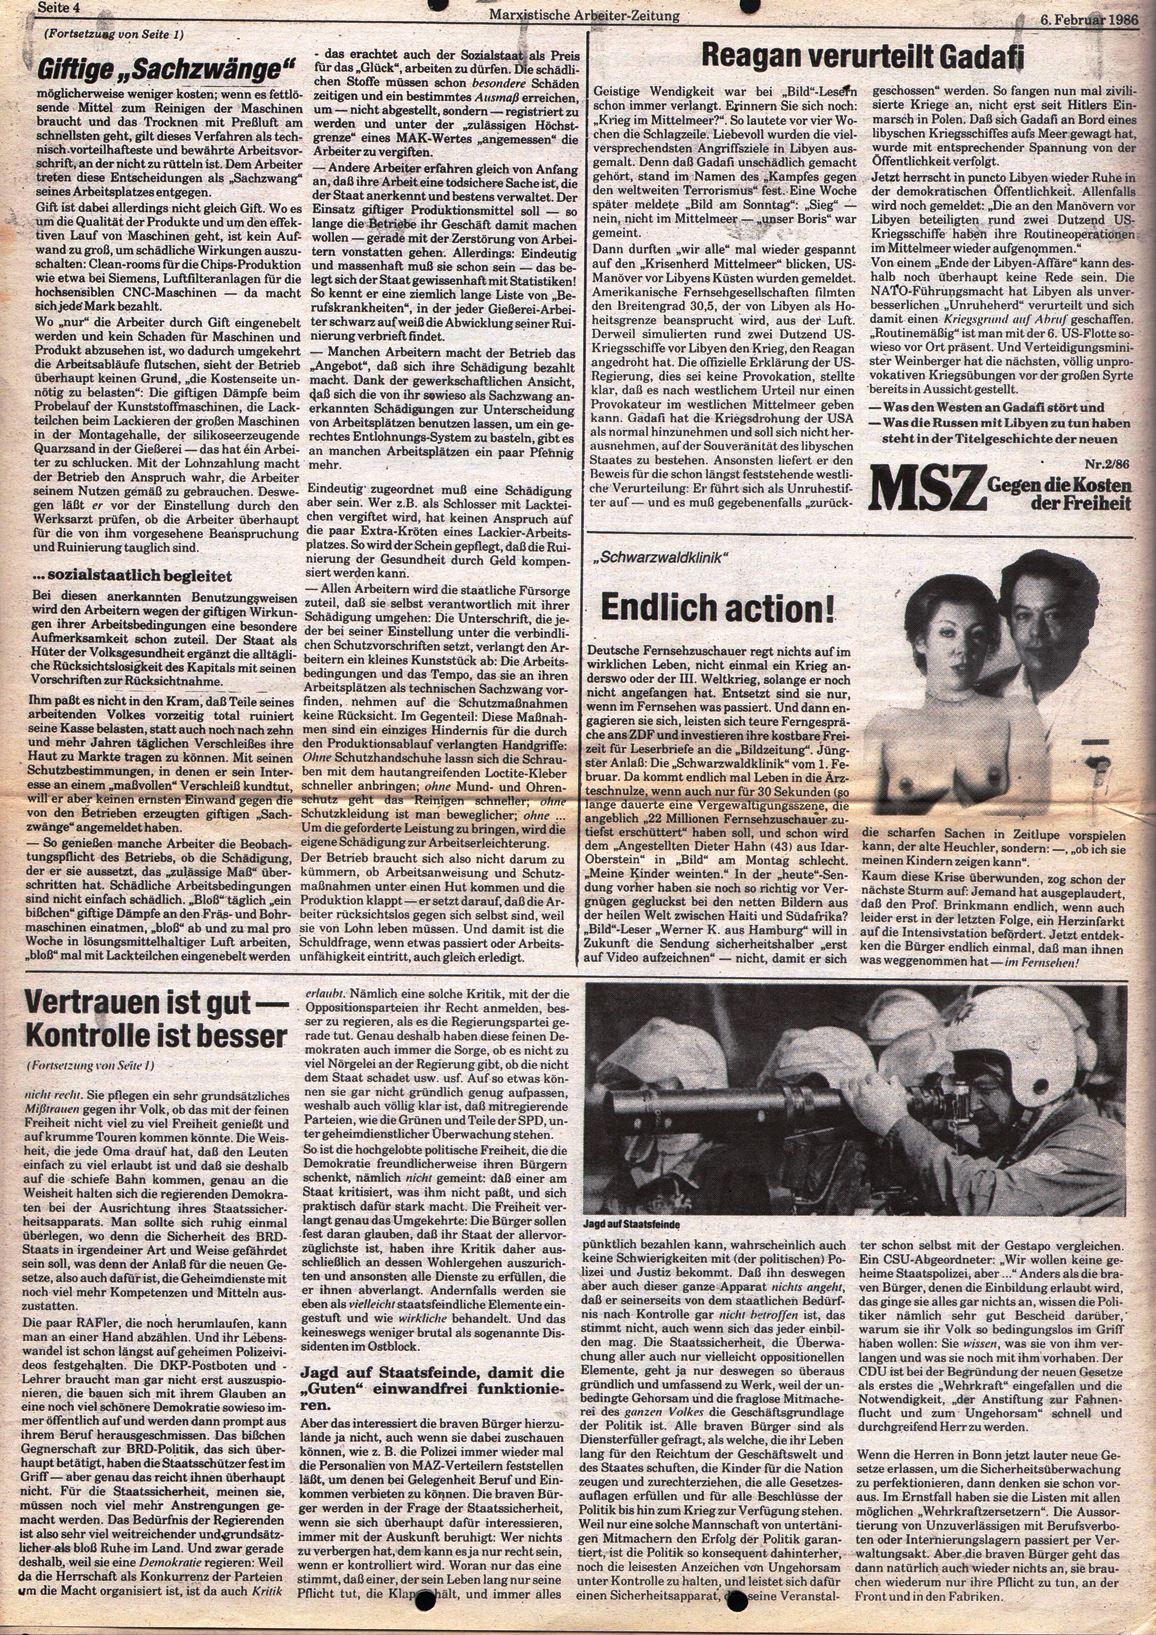 Muenchen_MG_MAZ_Krauss_Maffei_19860123_04